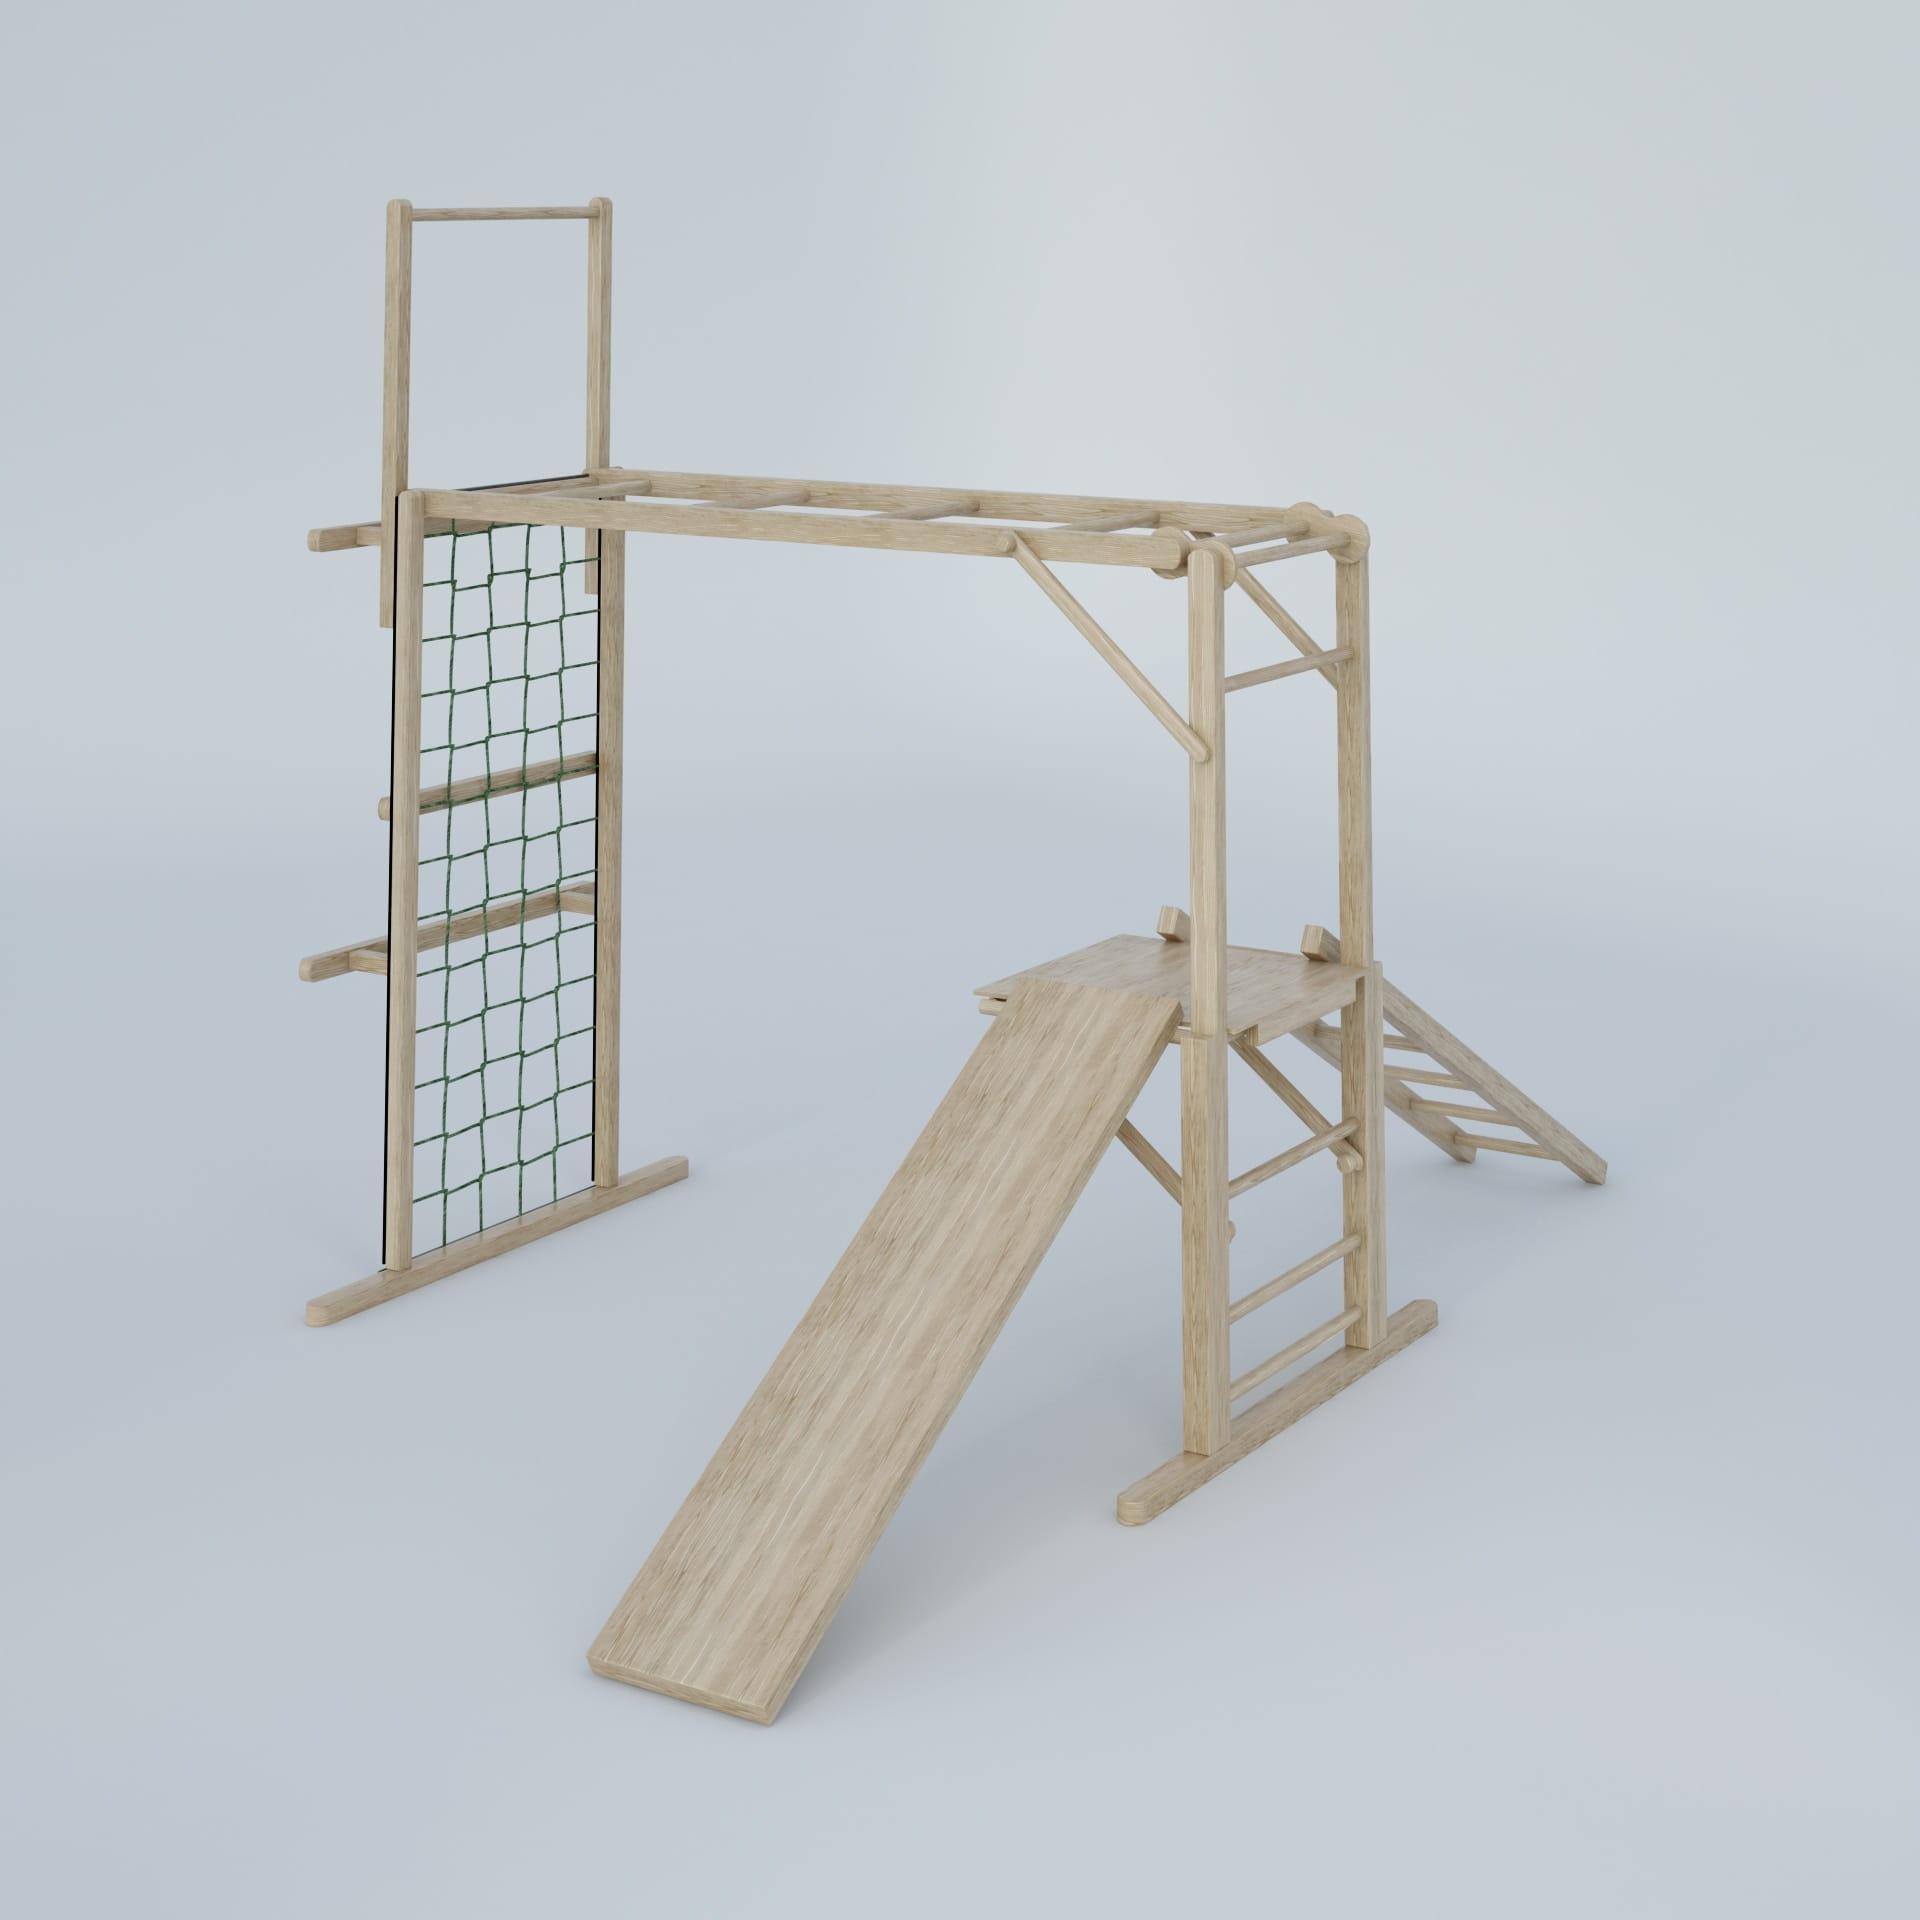 playground equipment 2 AM244 Archmodels